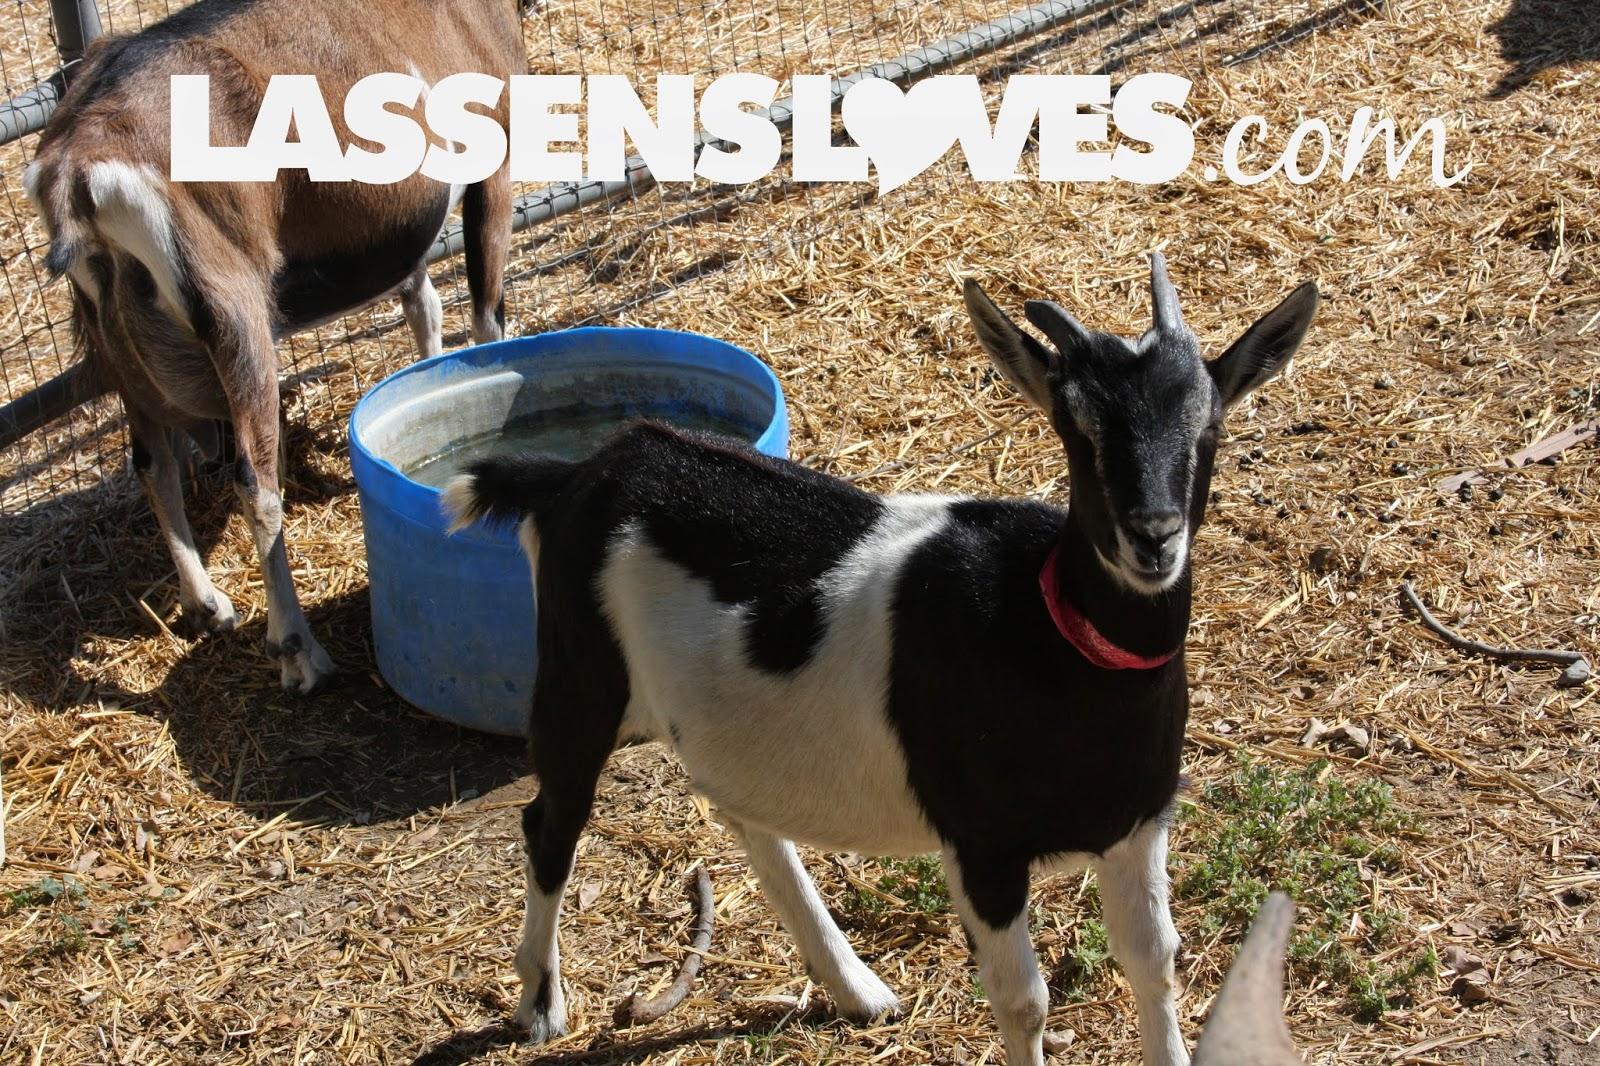 lassensloves.com, Lassen's, Chivas+Goat's+Milk+Skin+Care, Goat's+Milk